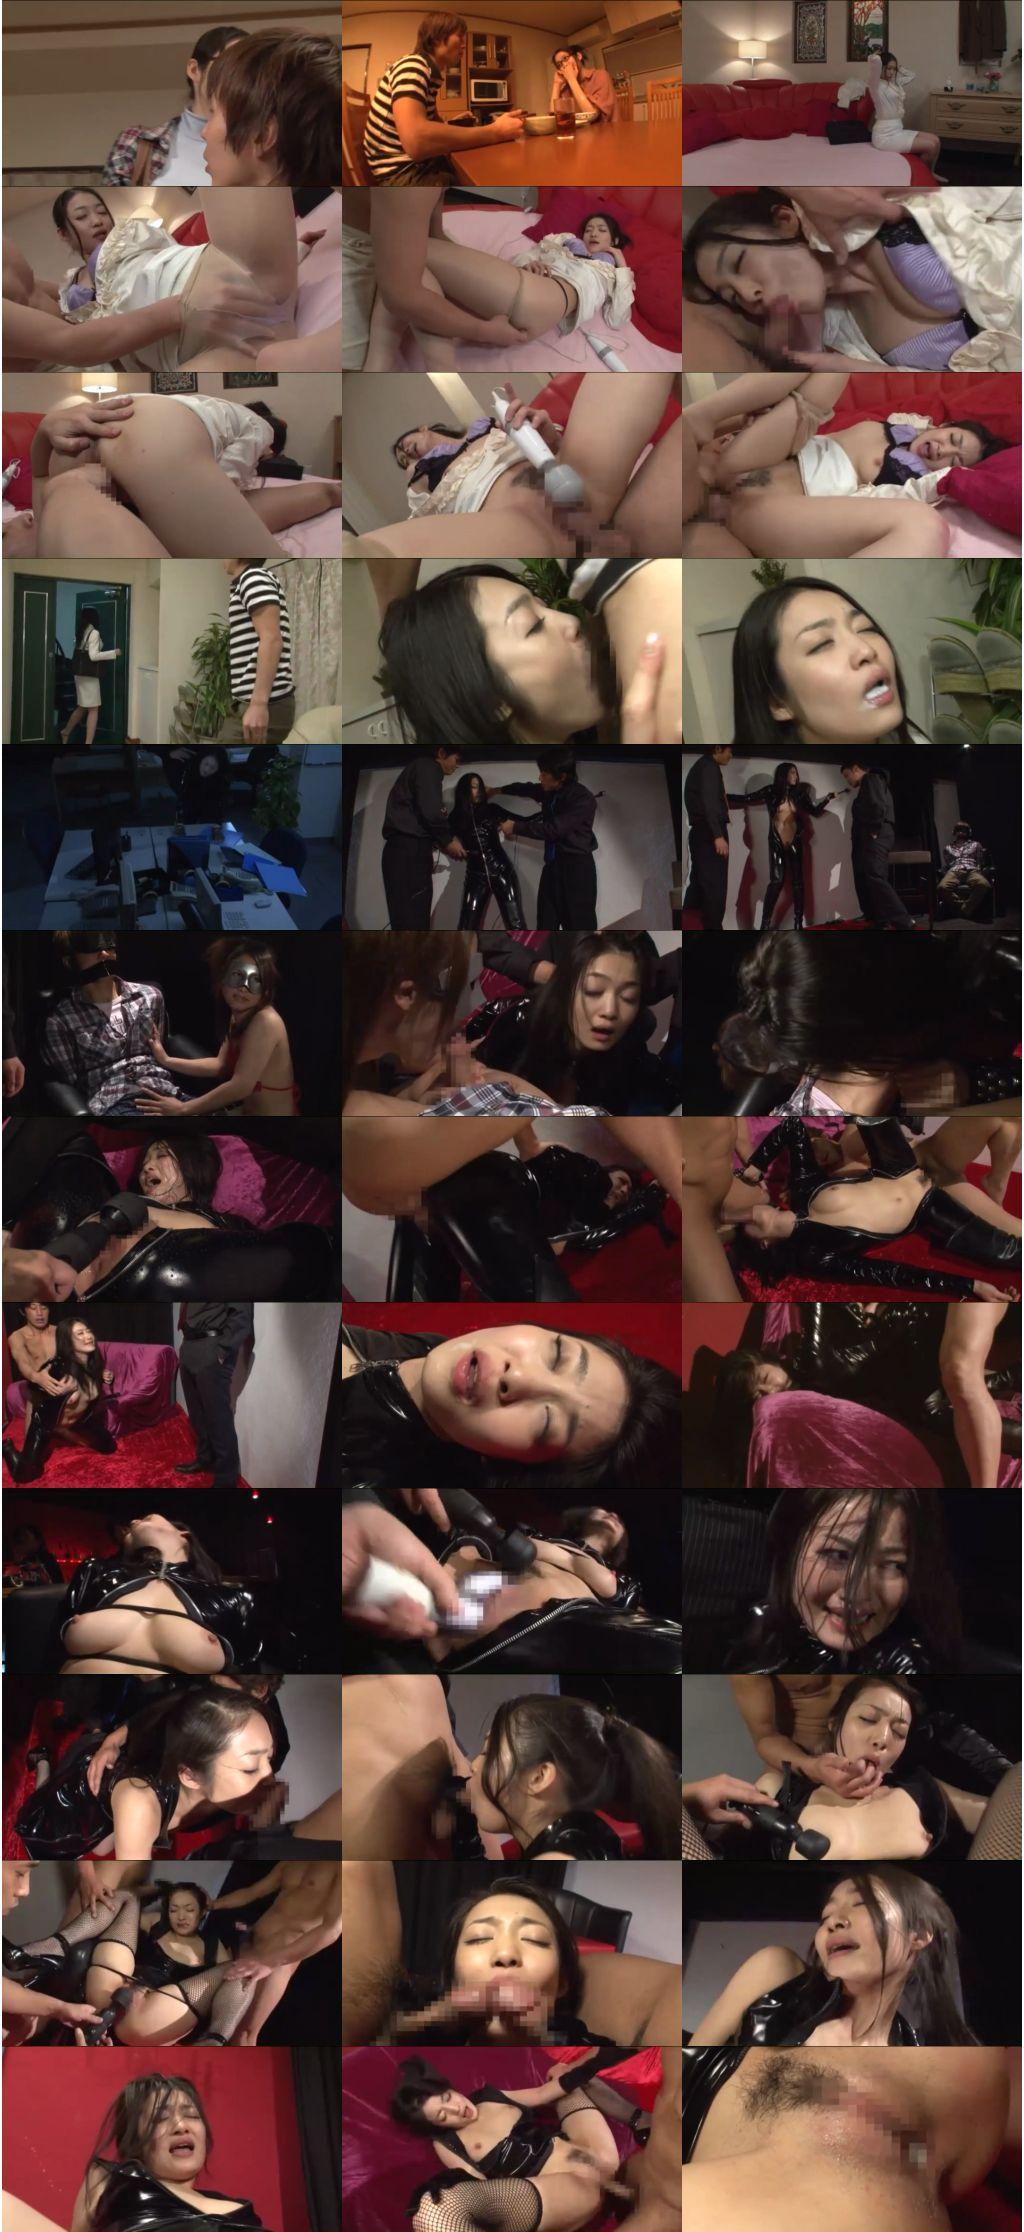 STAR 345 s - [STAR-345] 美人潜入捜査官 RYU  潮吹き SODstar 辱め 女優